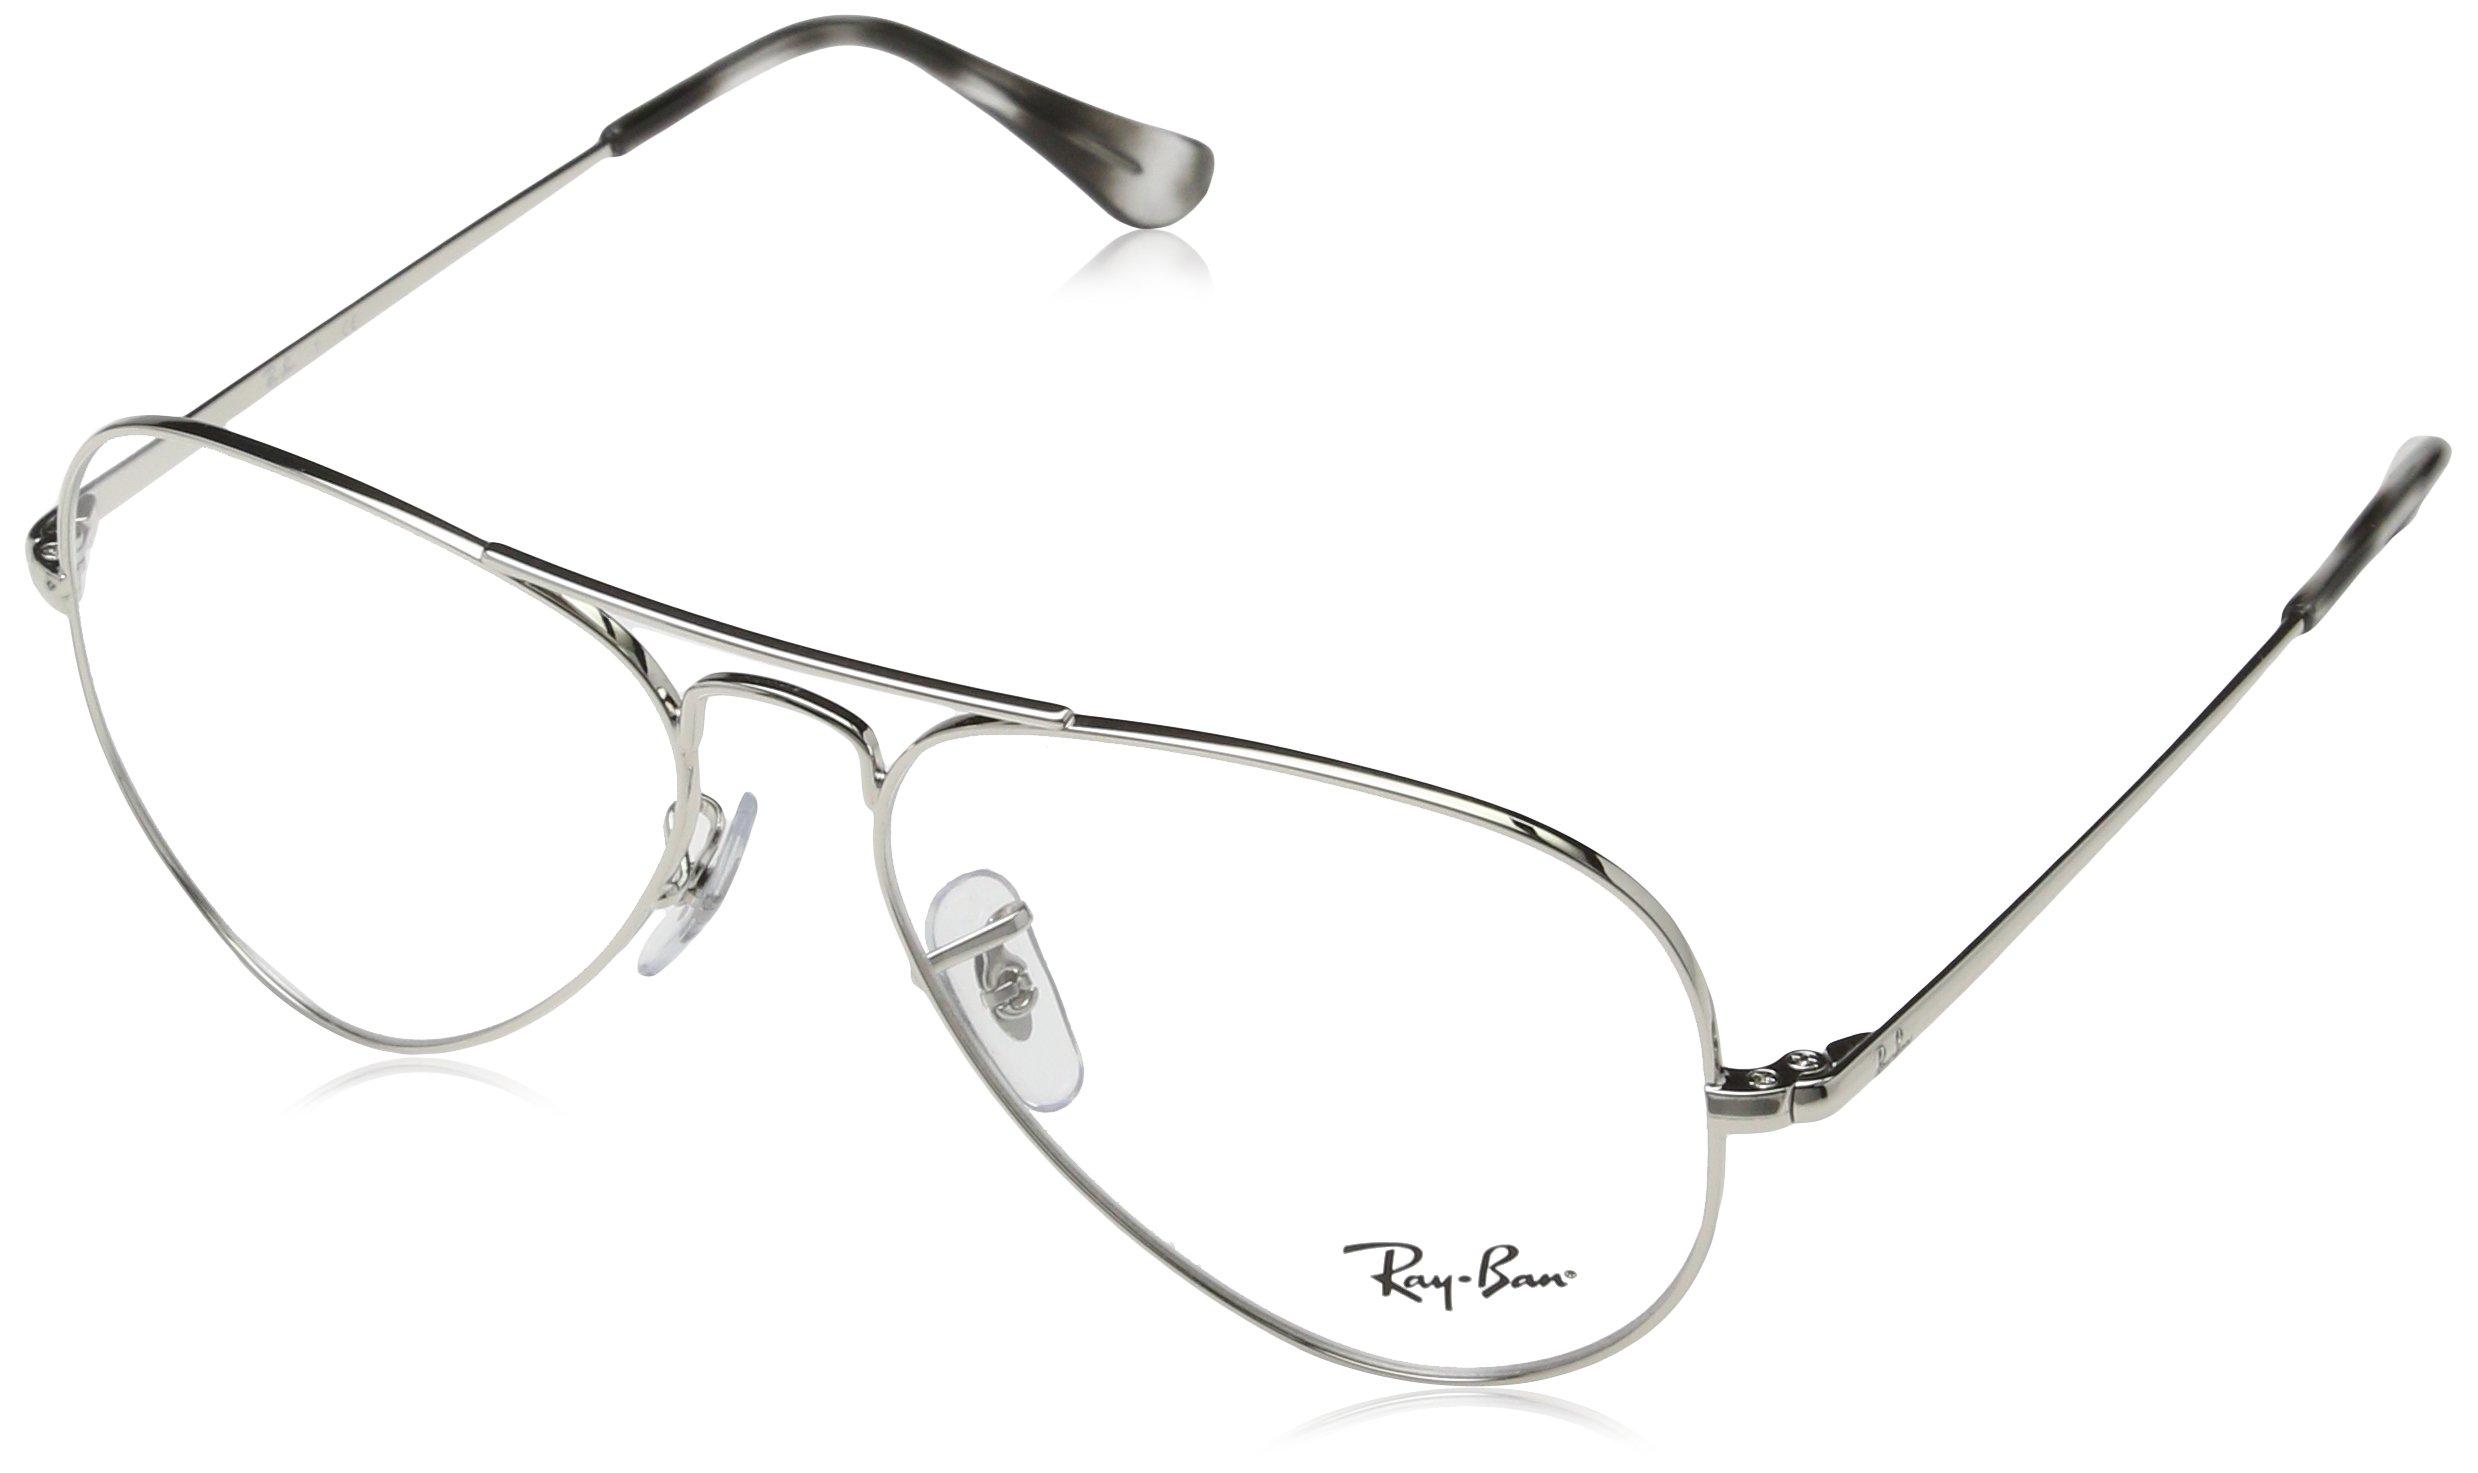 Ray-Ban RX6489 Aviator Metal Eyeglass Frames, Silver/Demo Lens, 55 mm by Ray-Ban